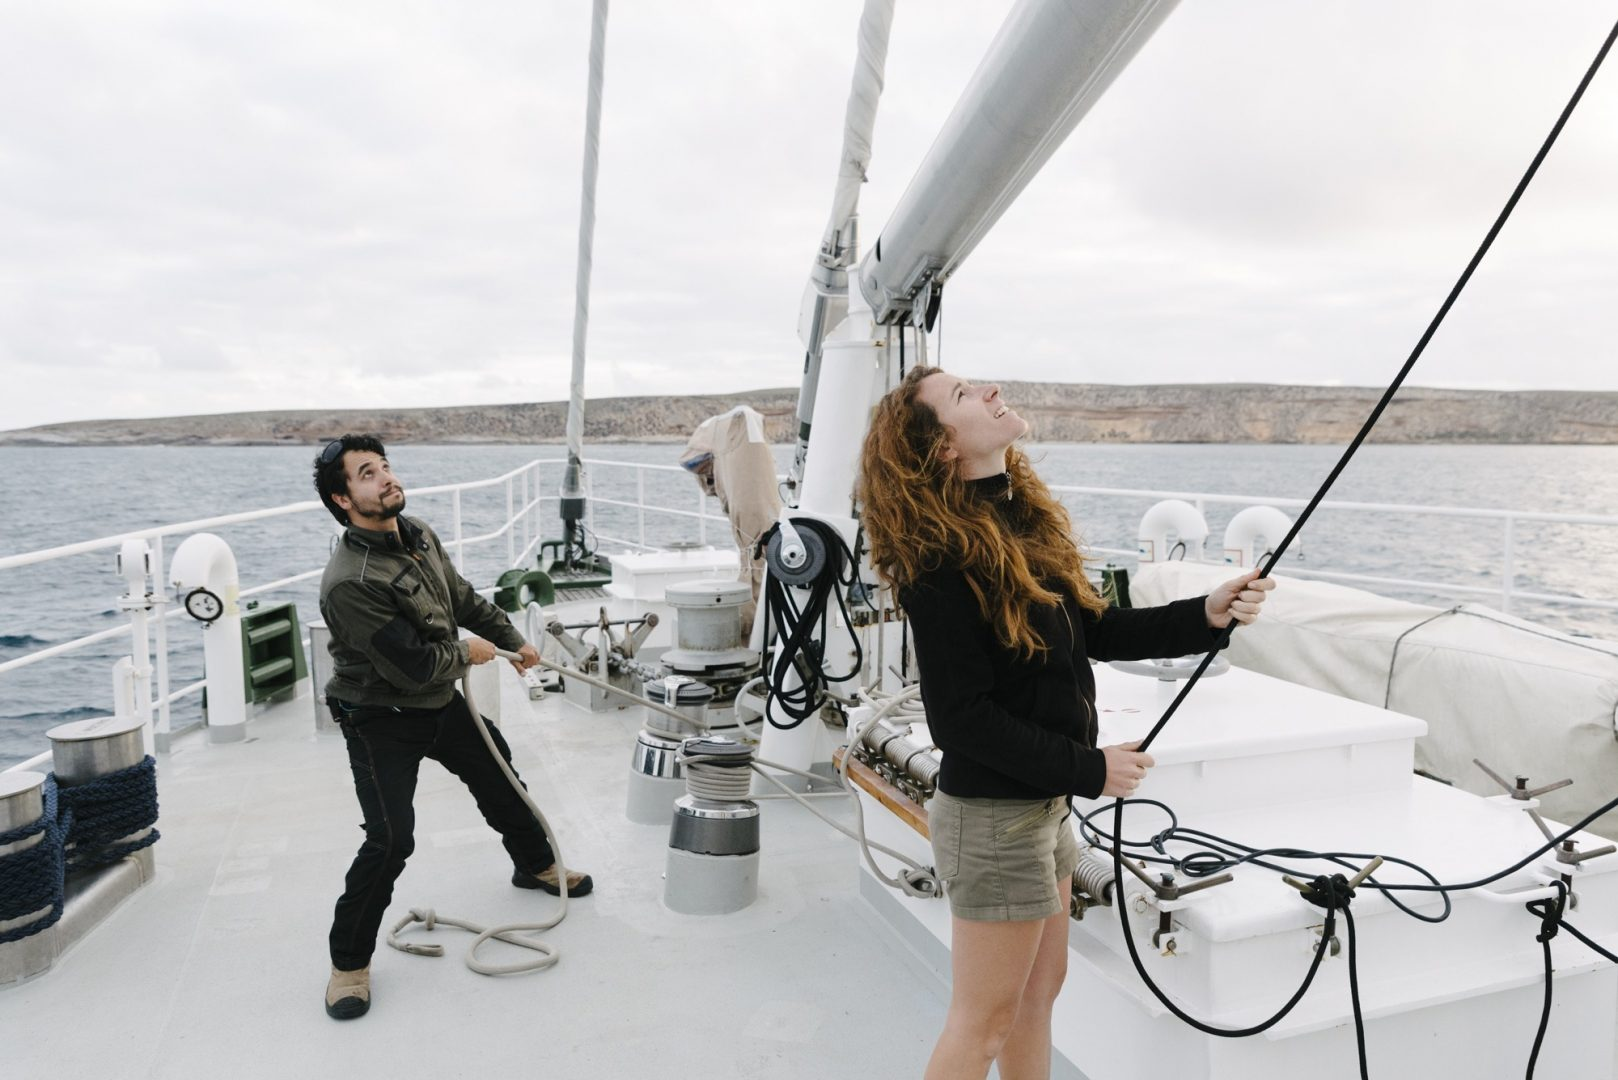 First mate Martina Martinez and Naz adjust te sails on board the Rainbow Warrior III.